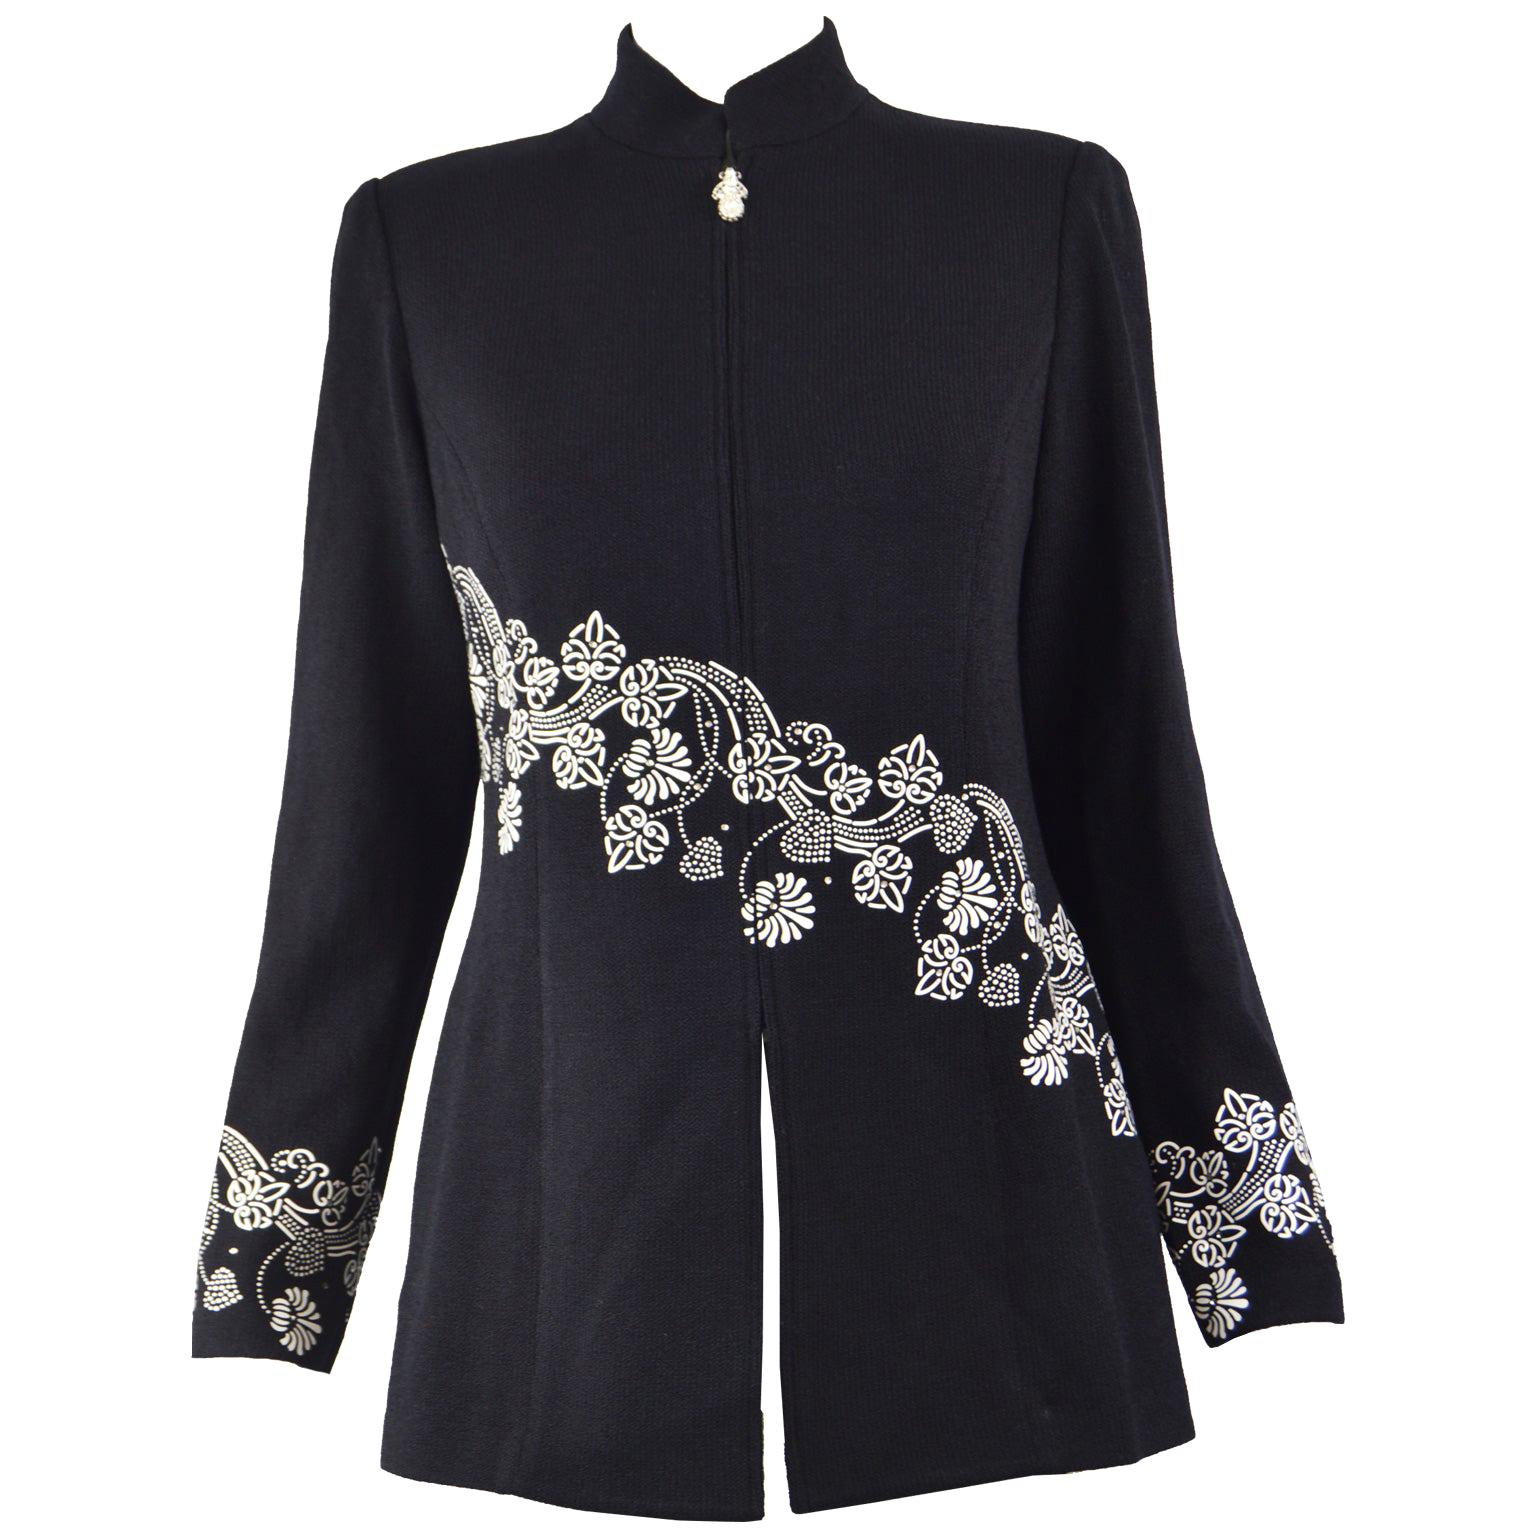 69ff9b746 Applique Jackets - 110 For Sale on 1stdibs